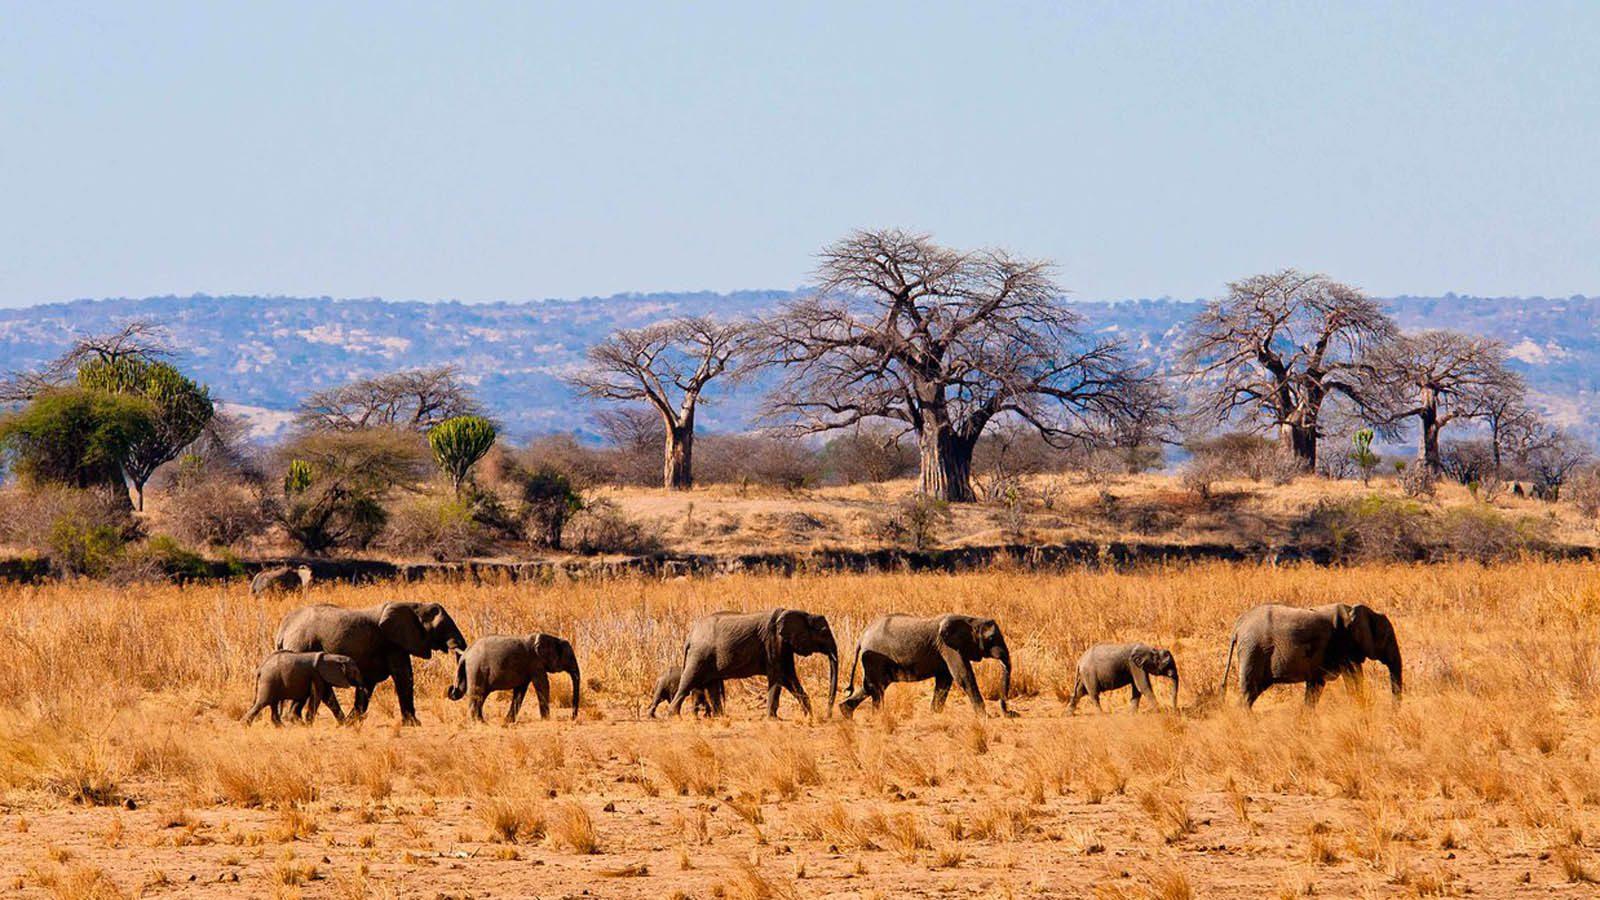 Wildlife in Tarangire National Park